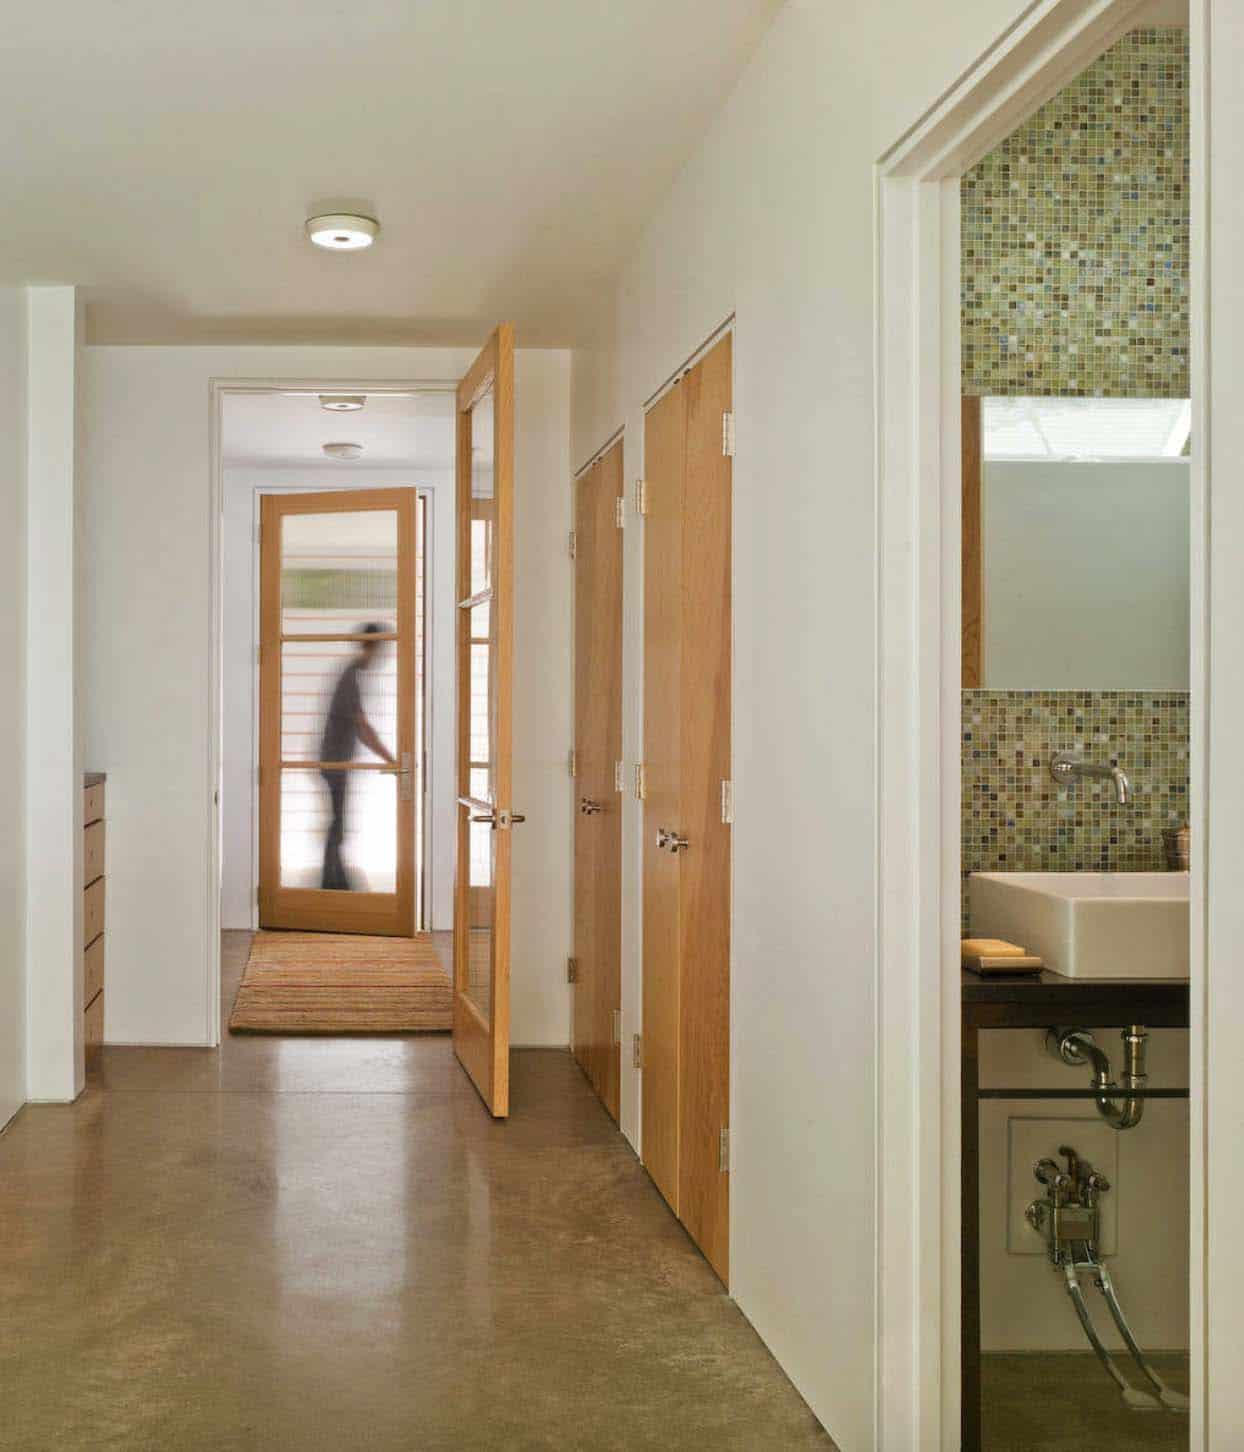 Modern Farm House-TruexCullins Architecture-06-1 Kindesign